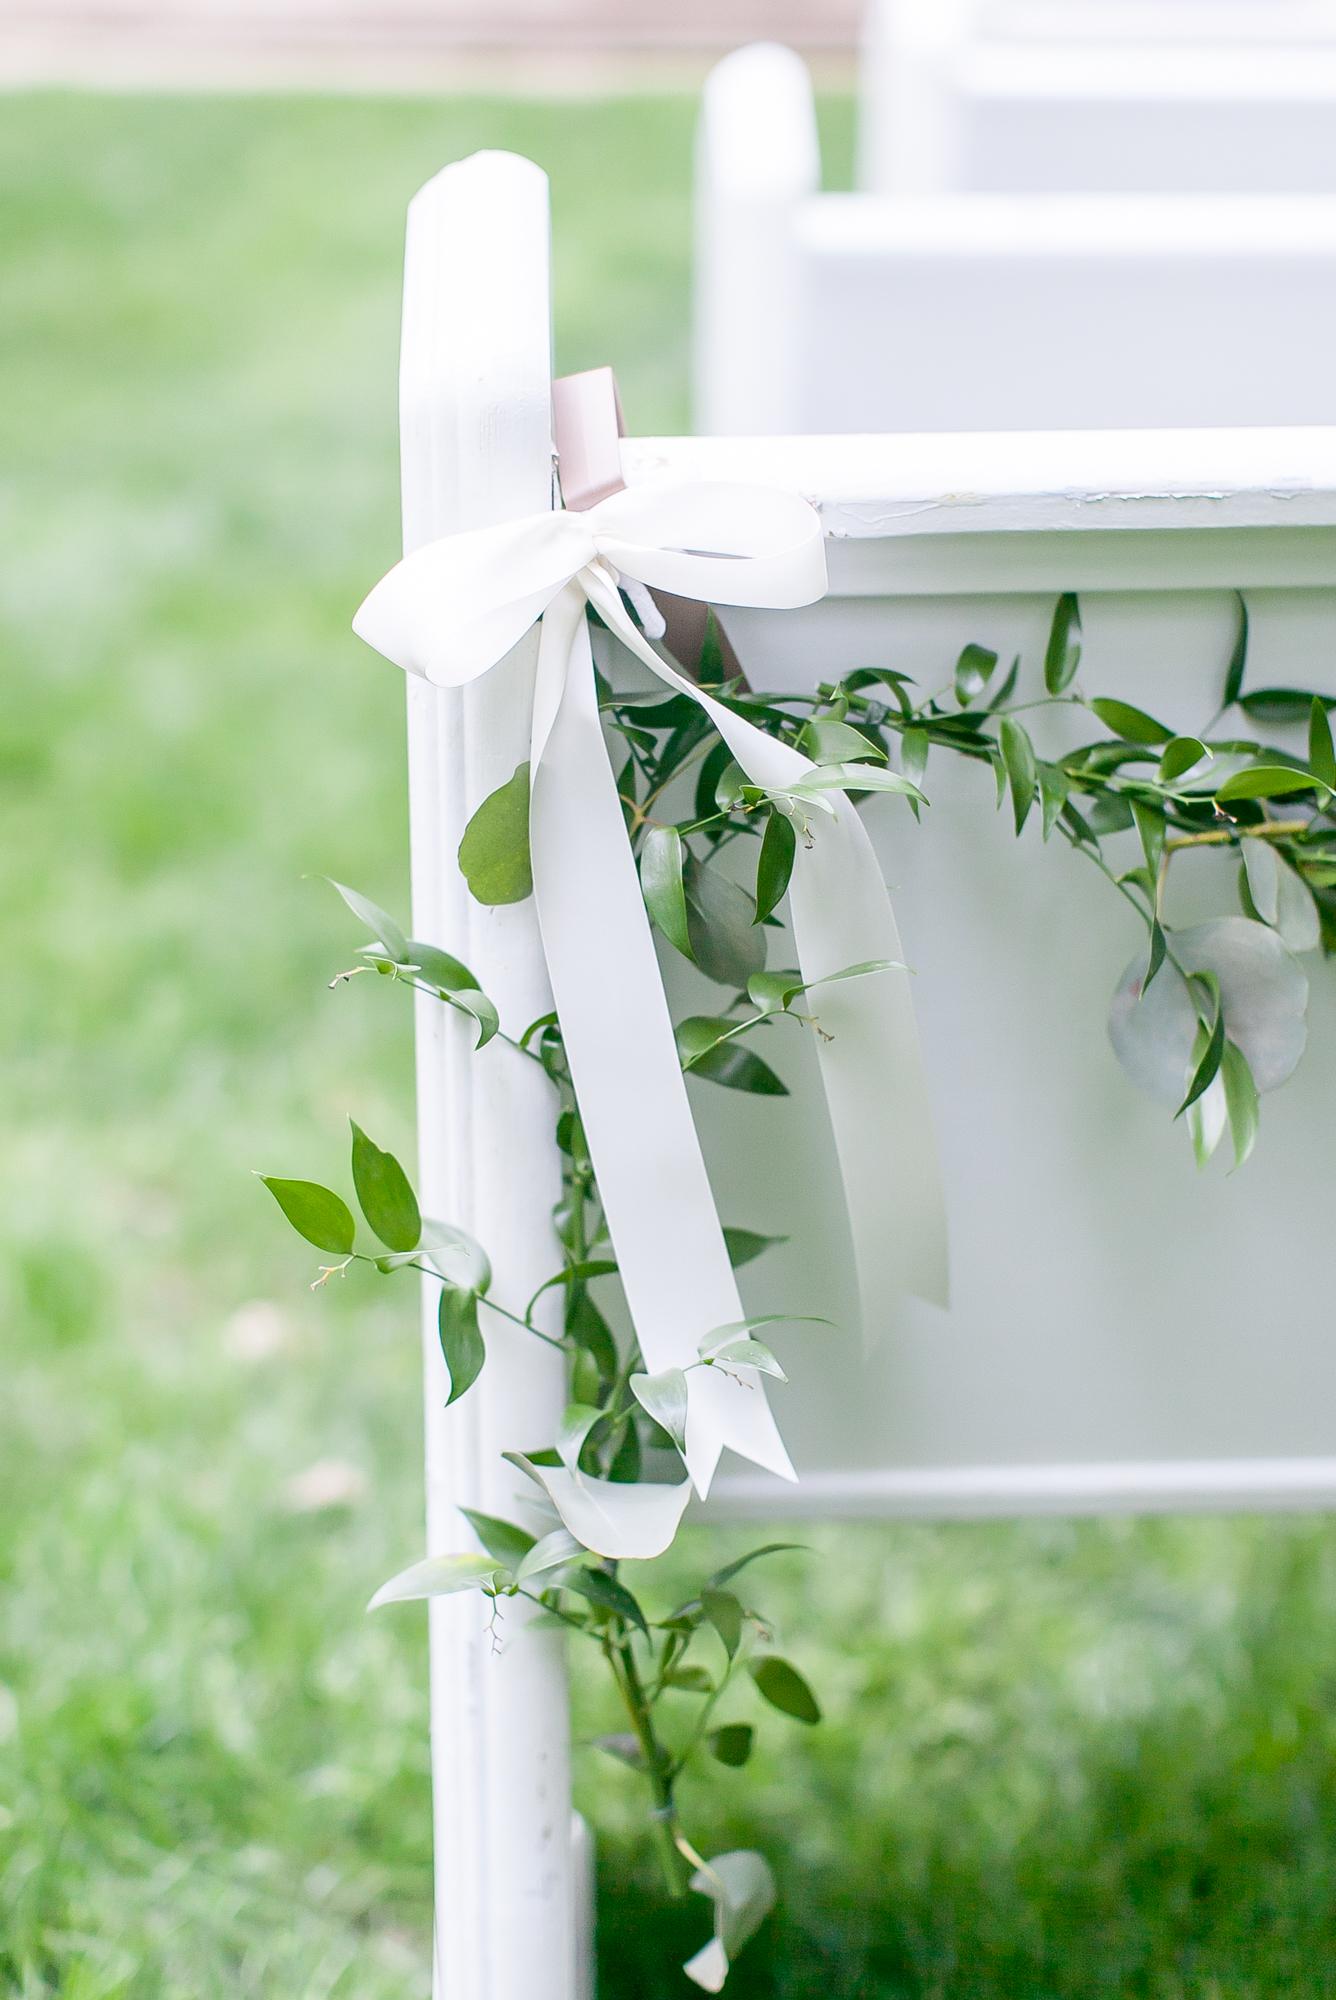 Weaver House of Pine Bend Park - Michigan Garden Wedding - The Overwhelmed Bride Wedding Blog